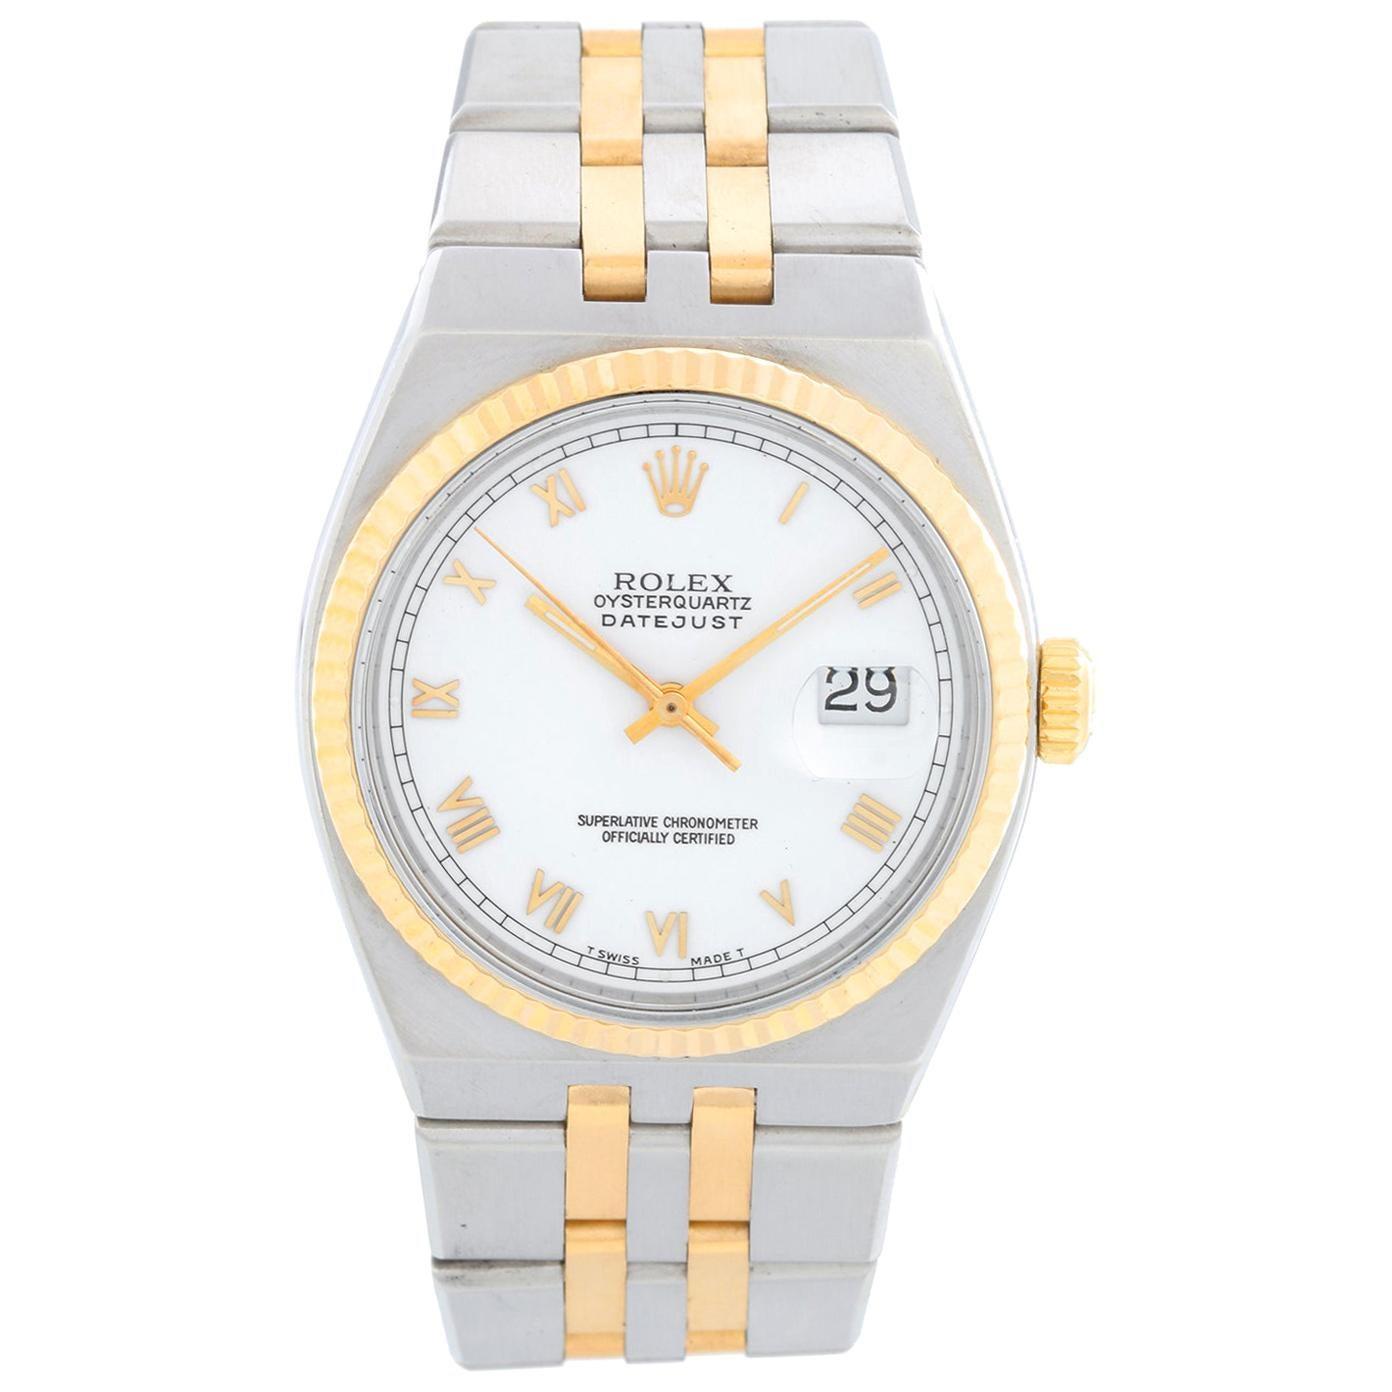 Rolex Oysterquartz Datejust 2-Tone Men's Watch 17013